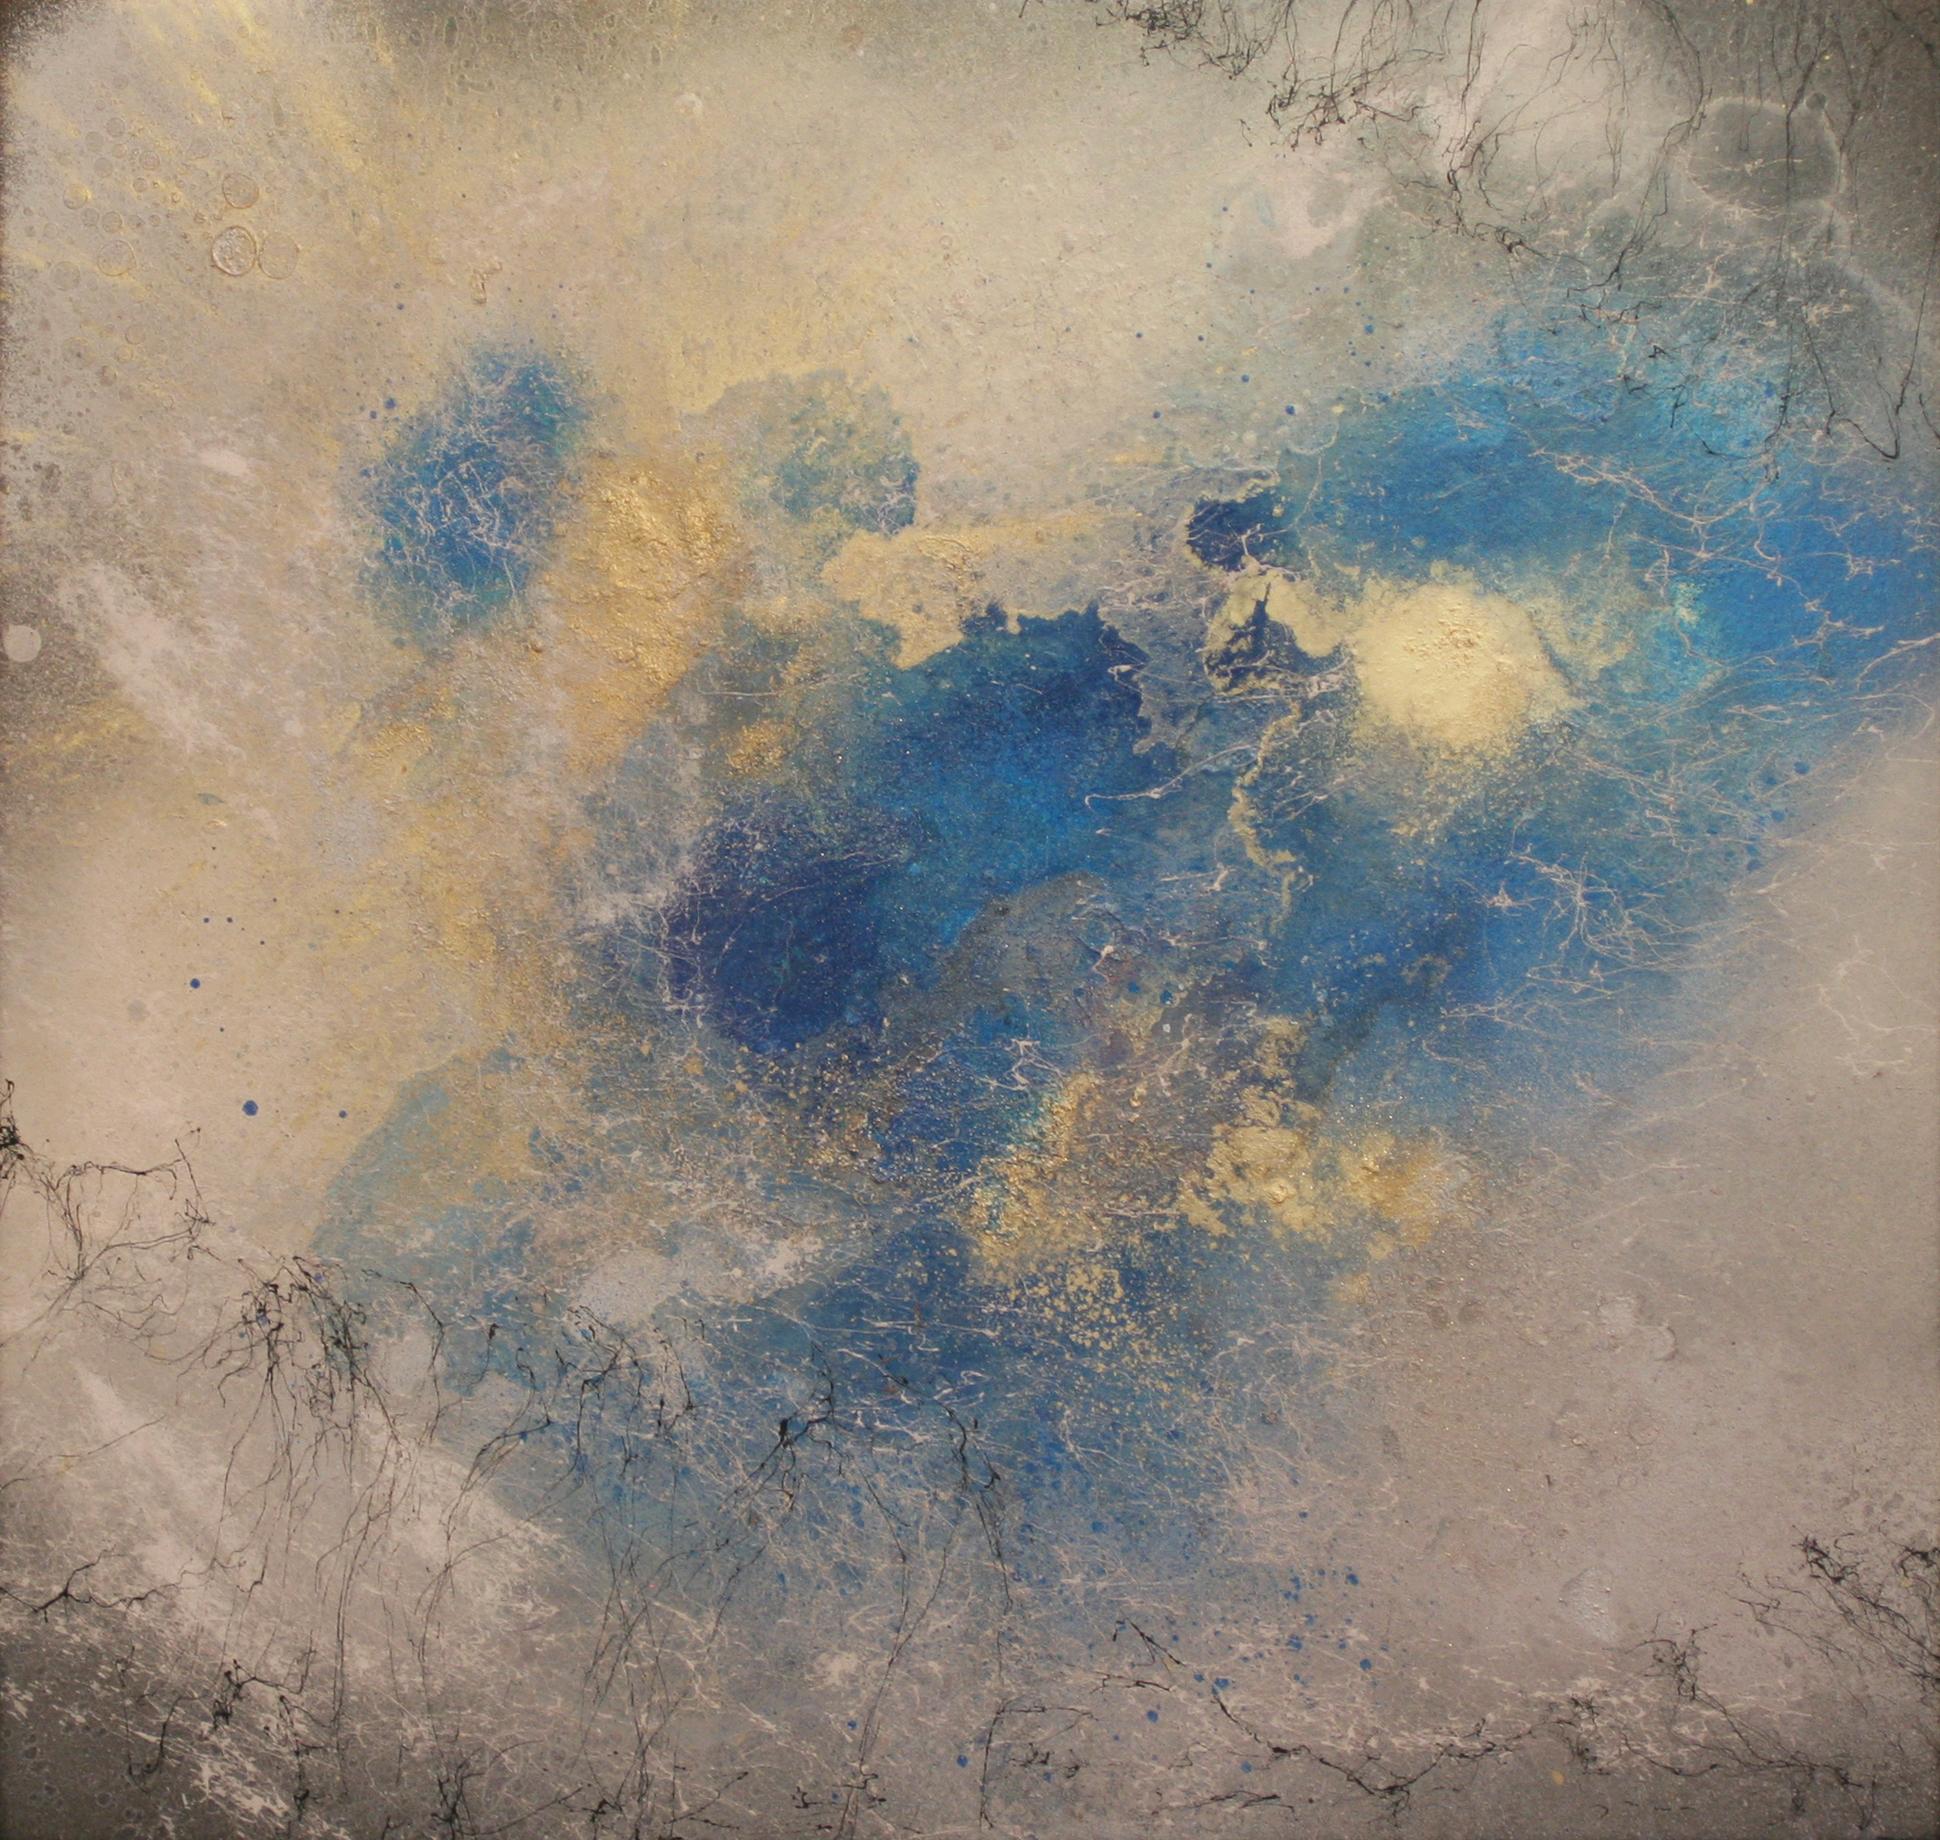 Nebel II, 2016, Acryl, Lack auf Emaille-Platte, 46x44cm